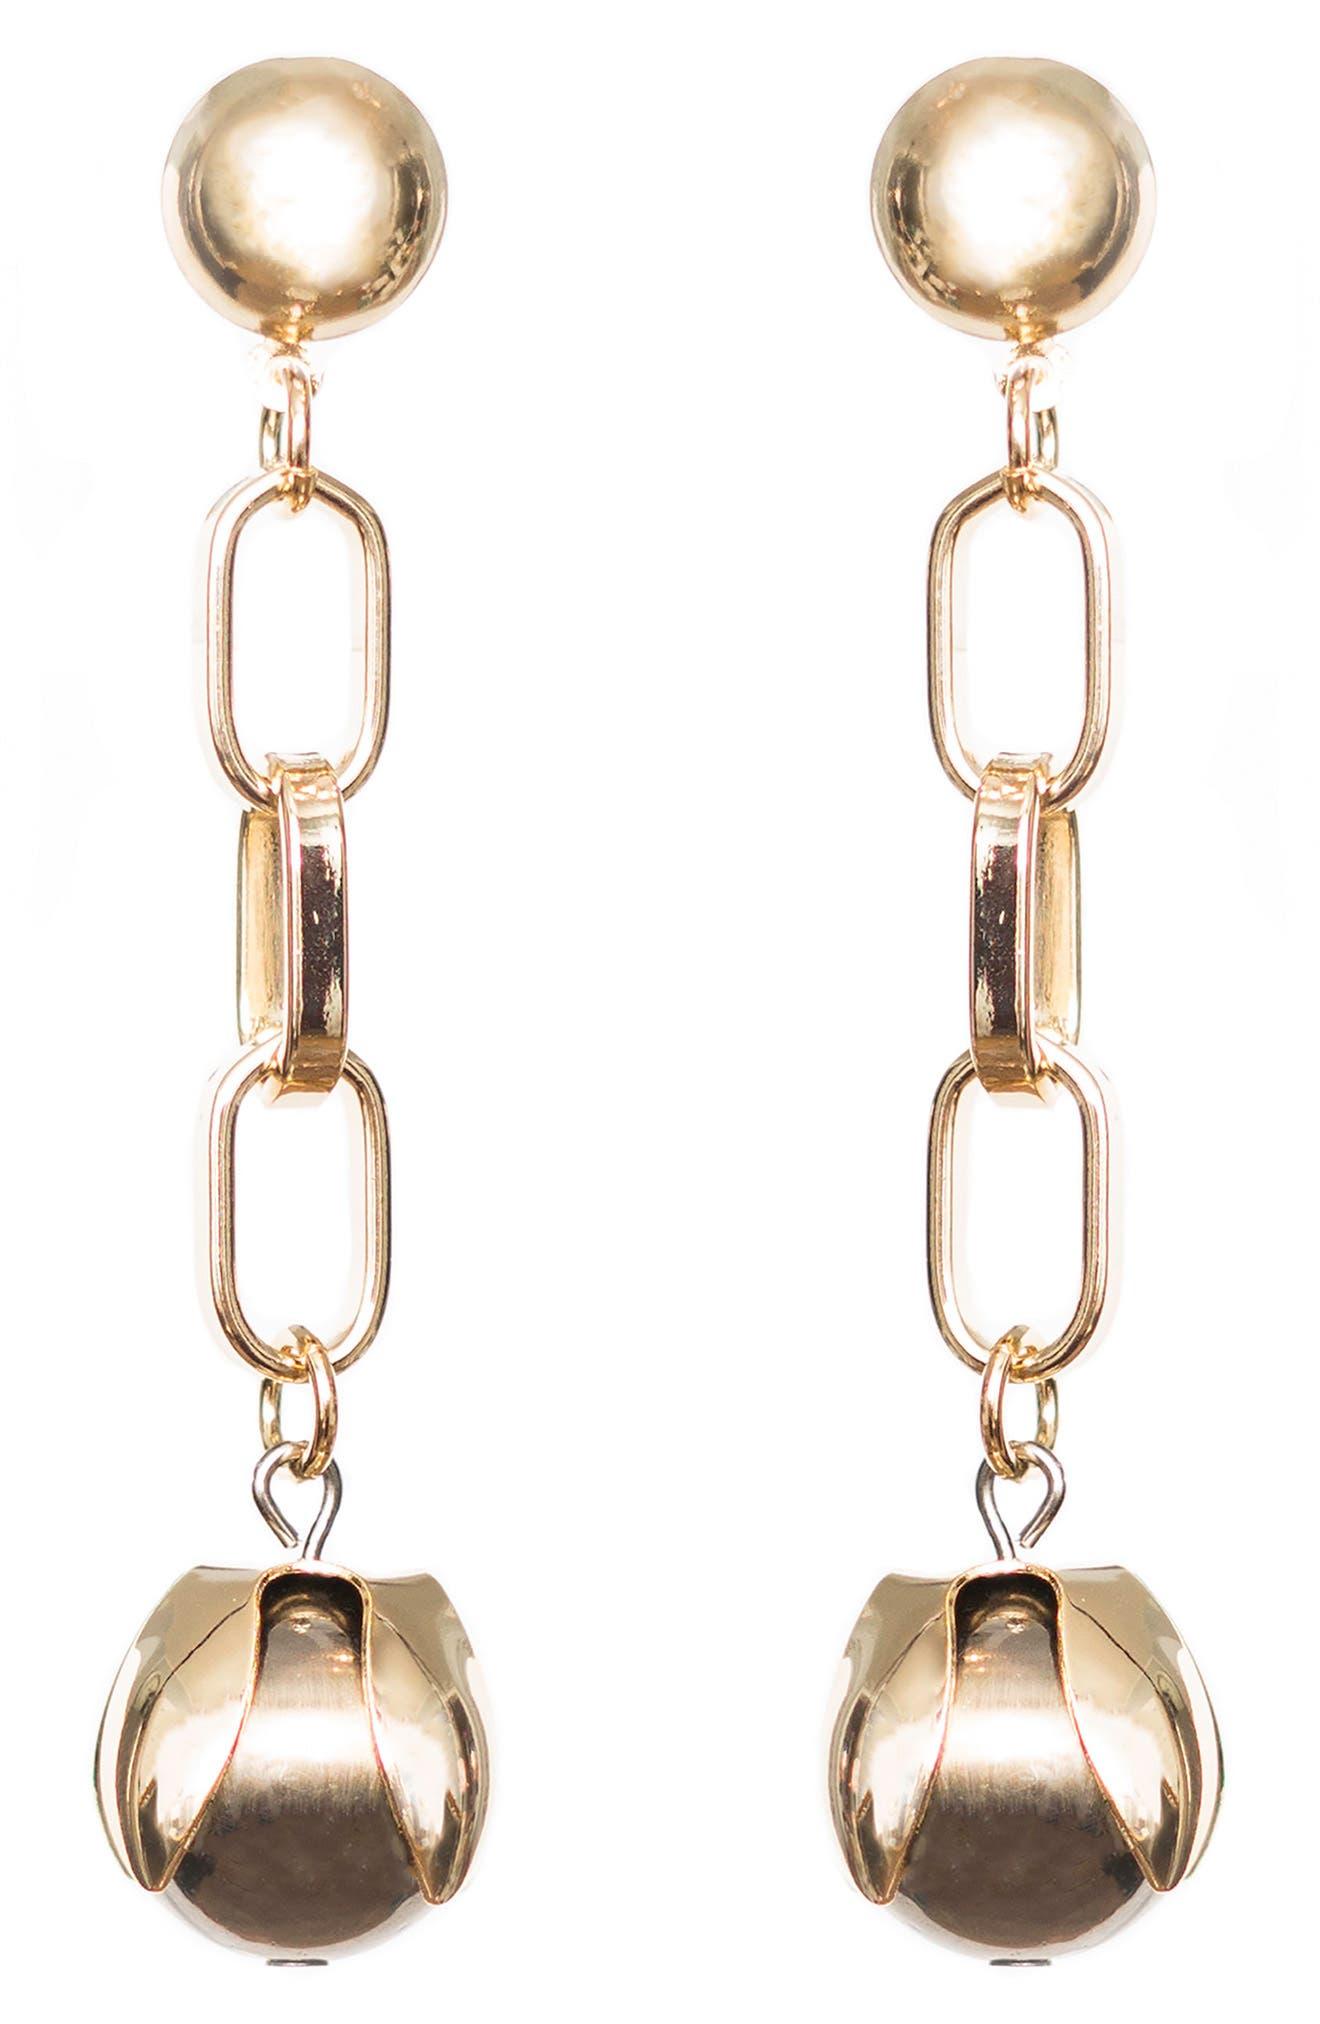 Orb Drop Chain Earrings,                             Main thumbnail 1, color,                             710